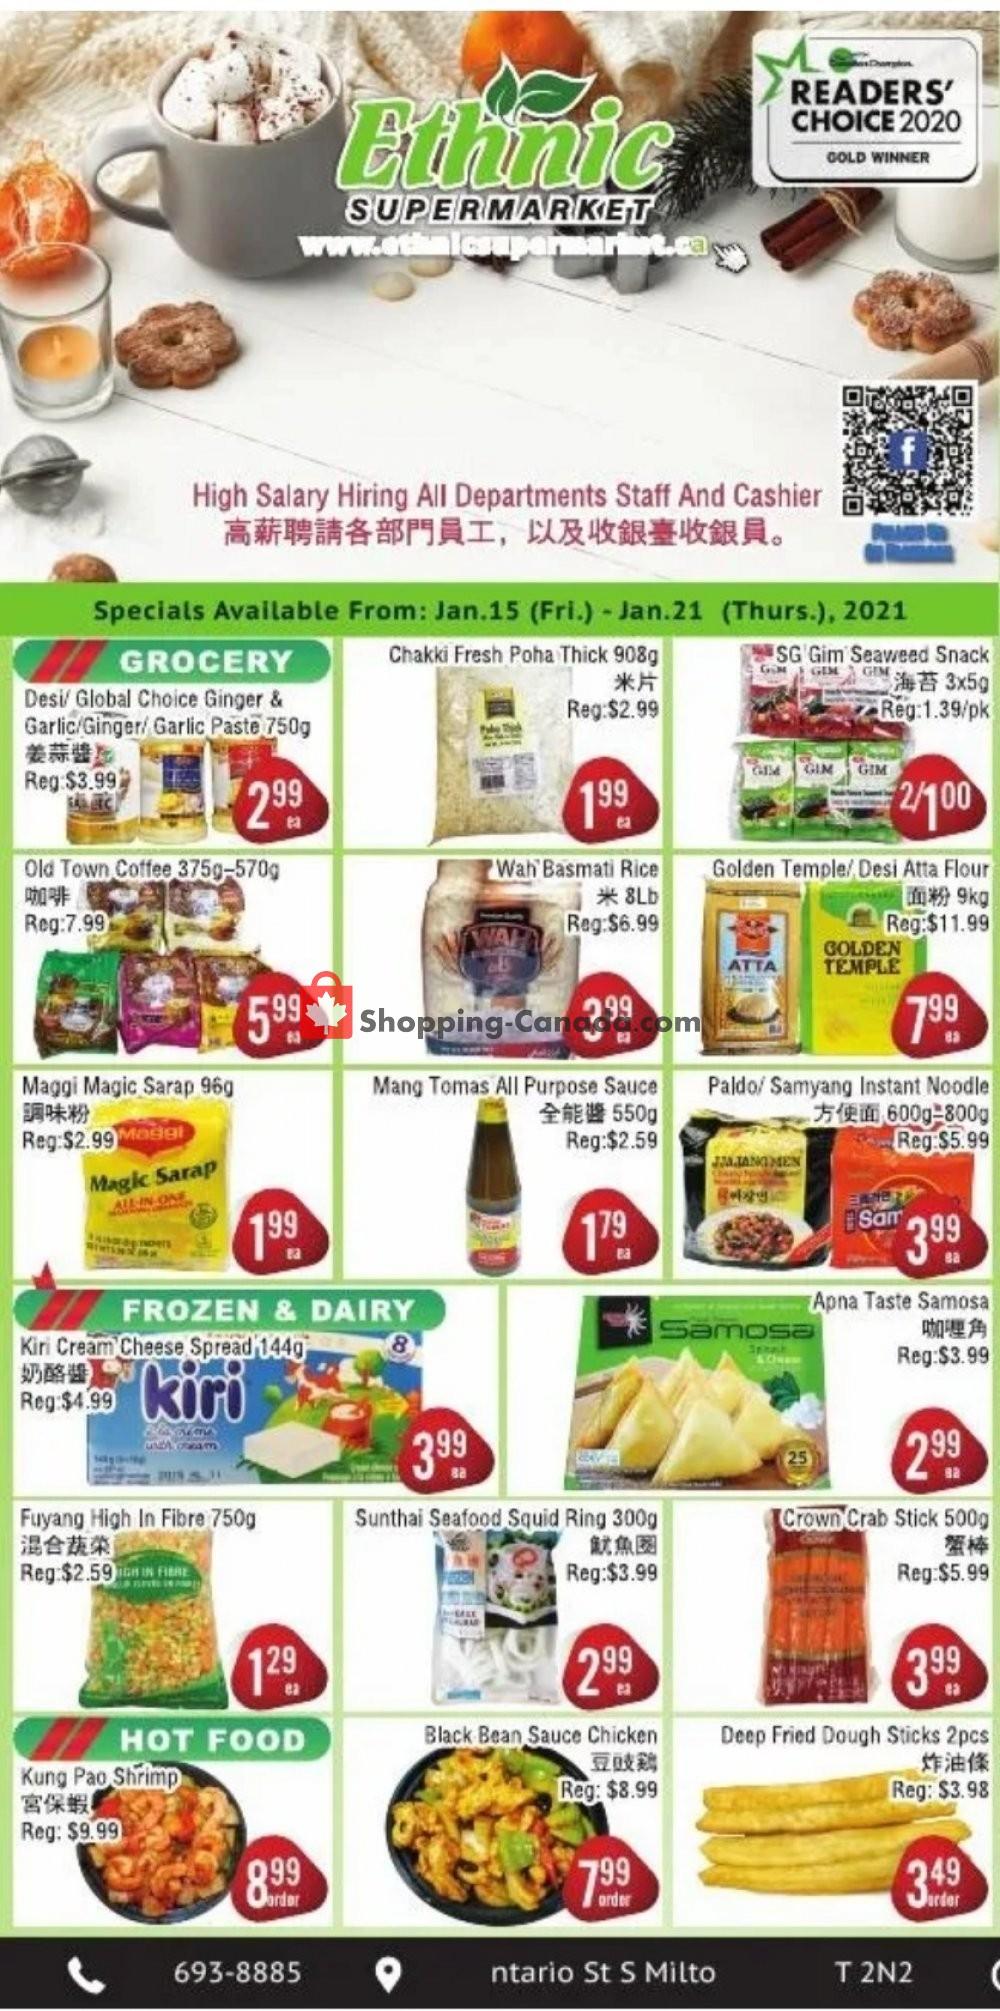 Flyer Ethnic Supermarket Canada - from Friday January 15, 2021 to Thursday January 21, 2021